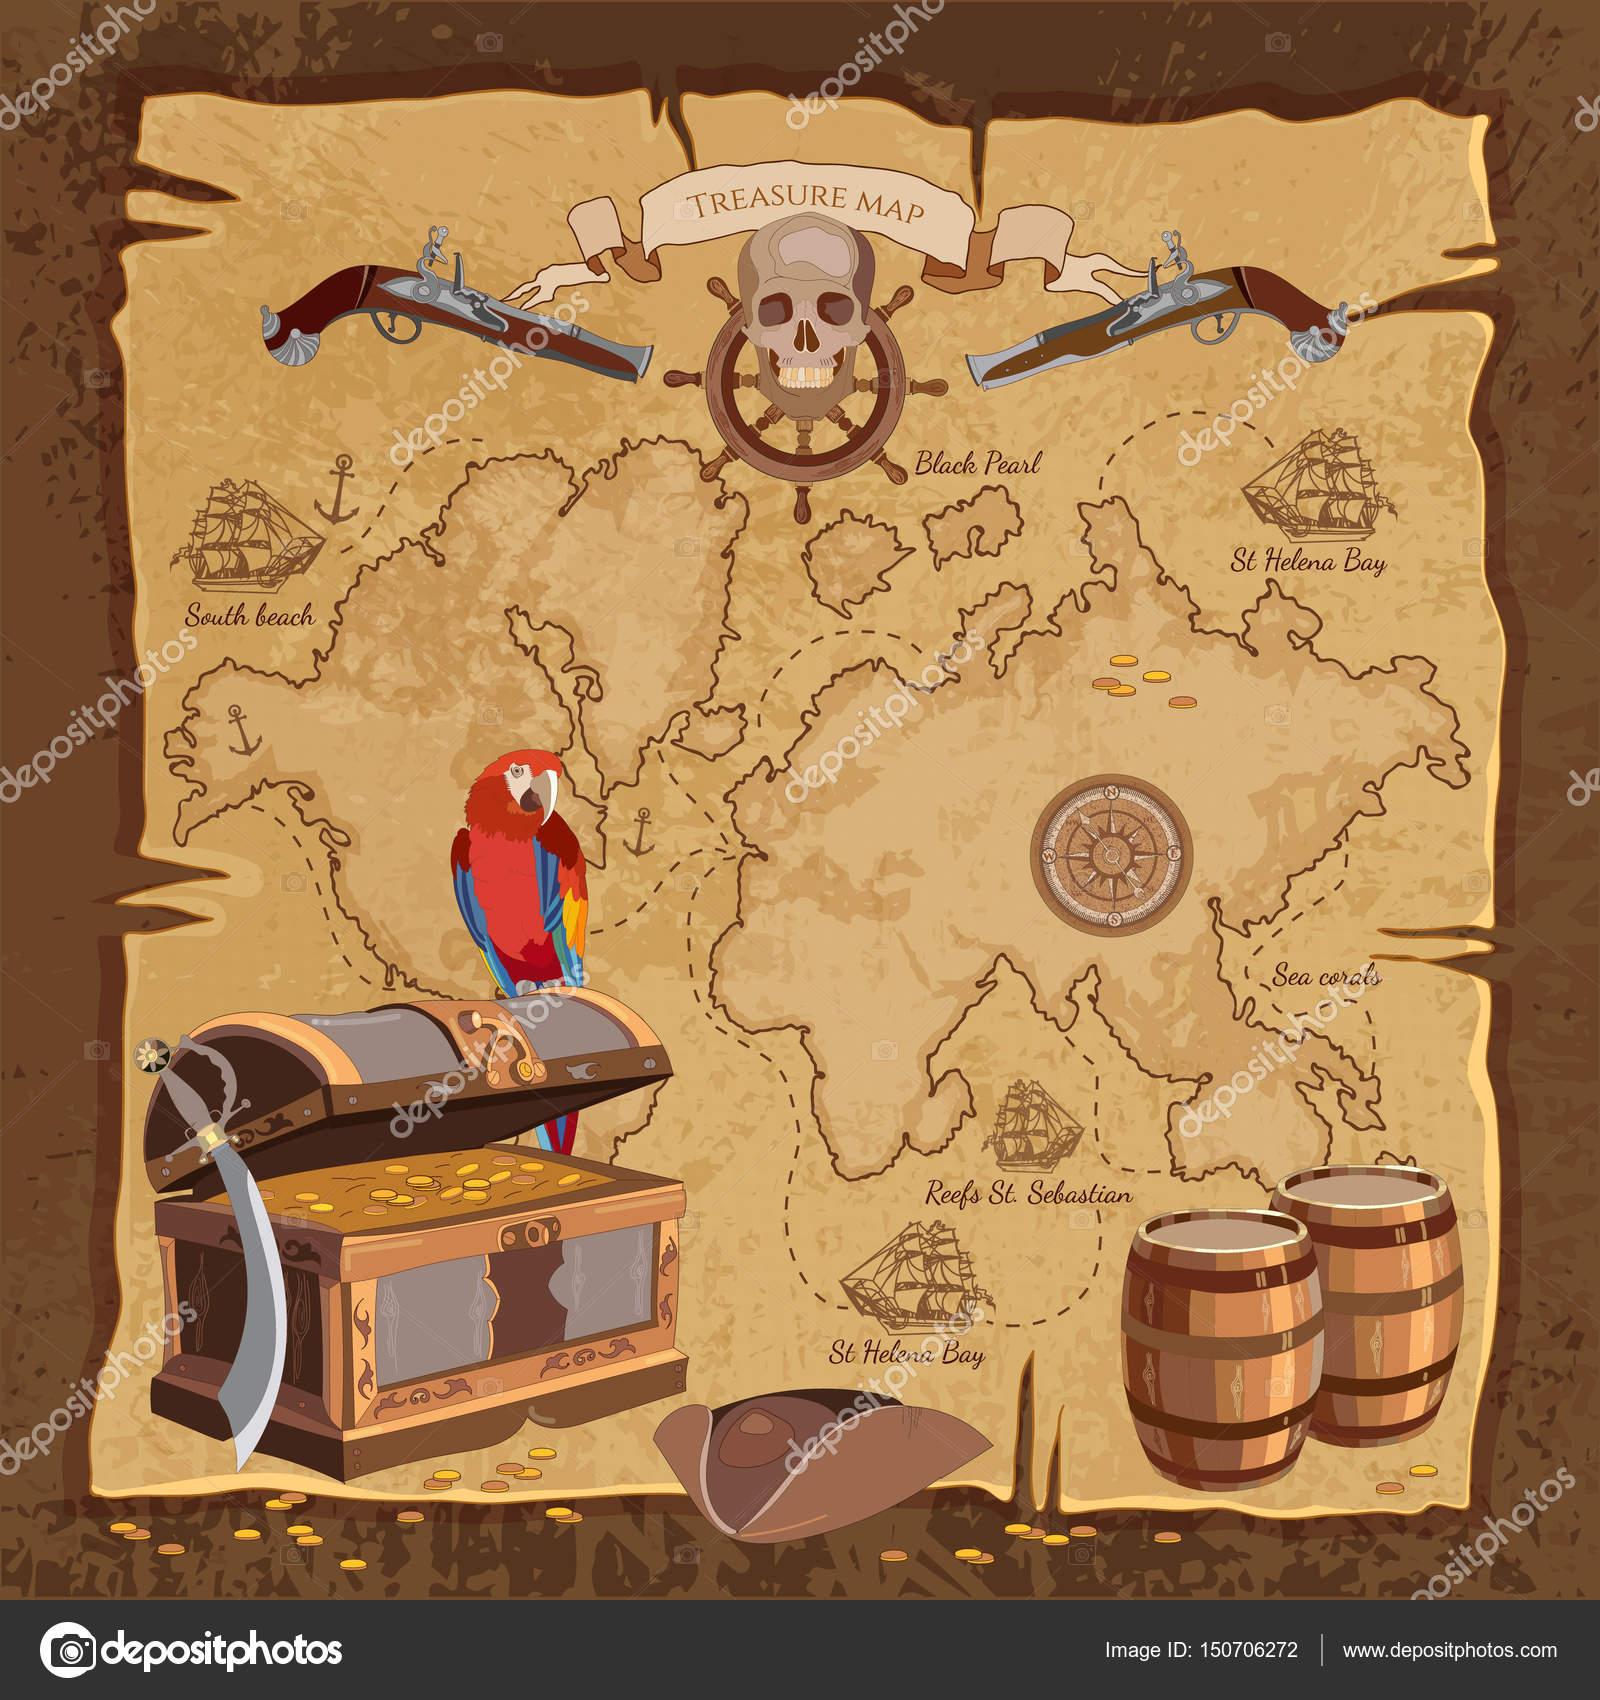 Carte Au Tresor Histoire.Ancienne Carte Au Tresor De Pirate Crane De Perroquet Pour